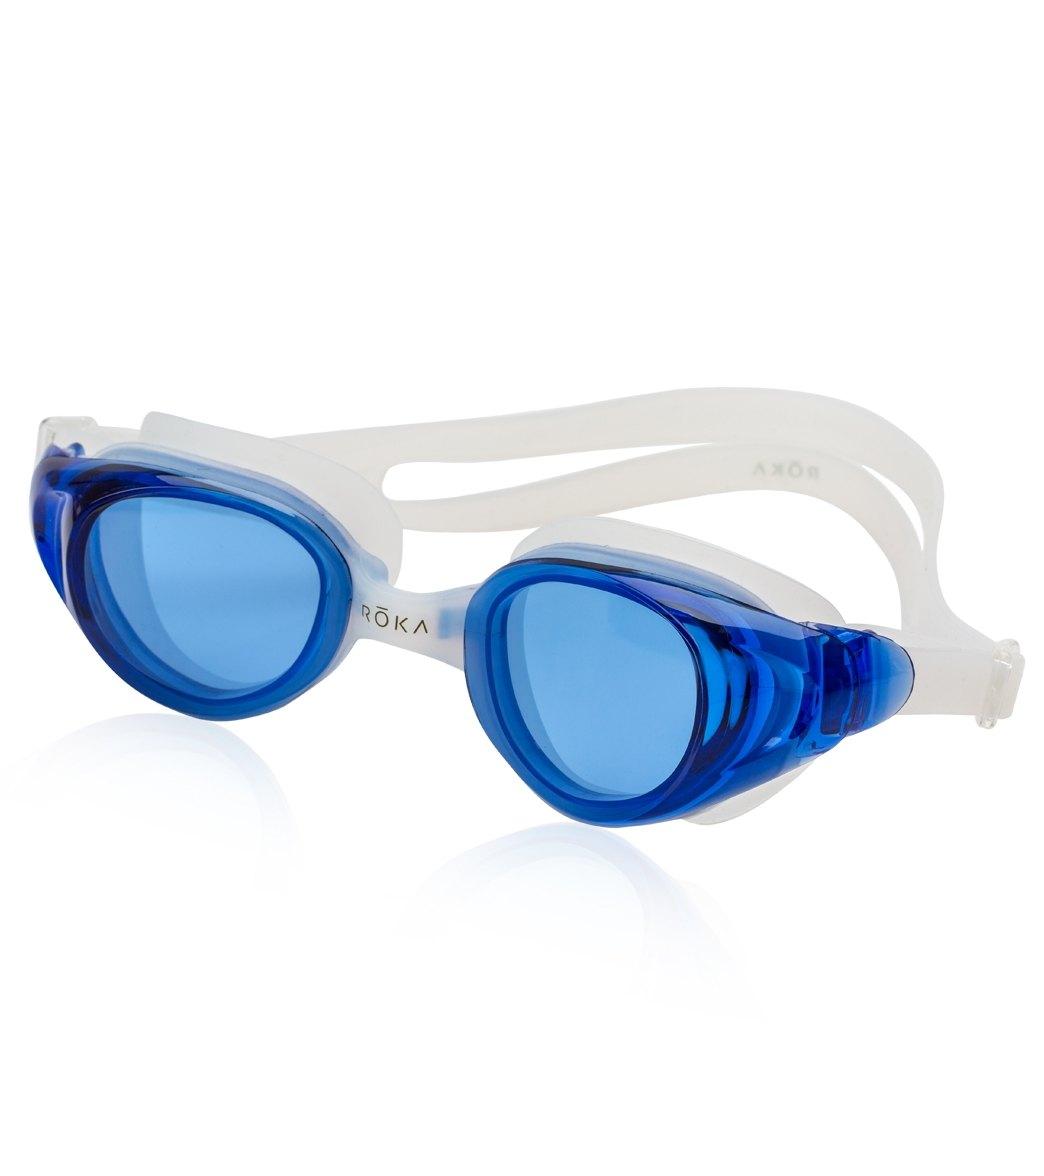 effe2061380 ROKA Sports X1 Oversize Goggles at SwimOutlet.com